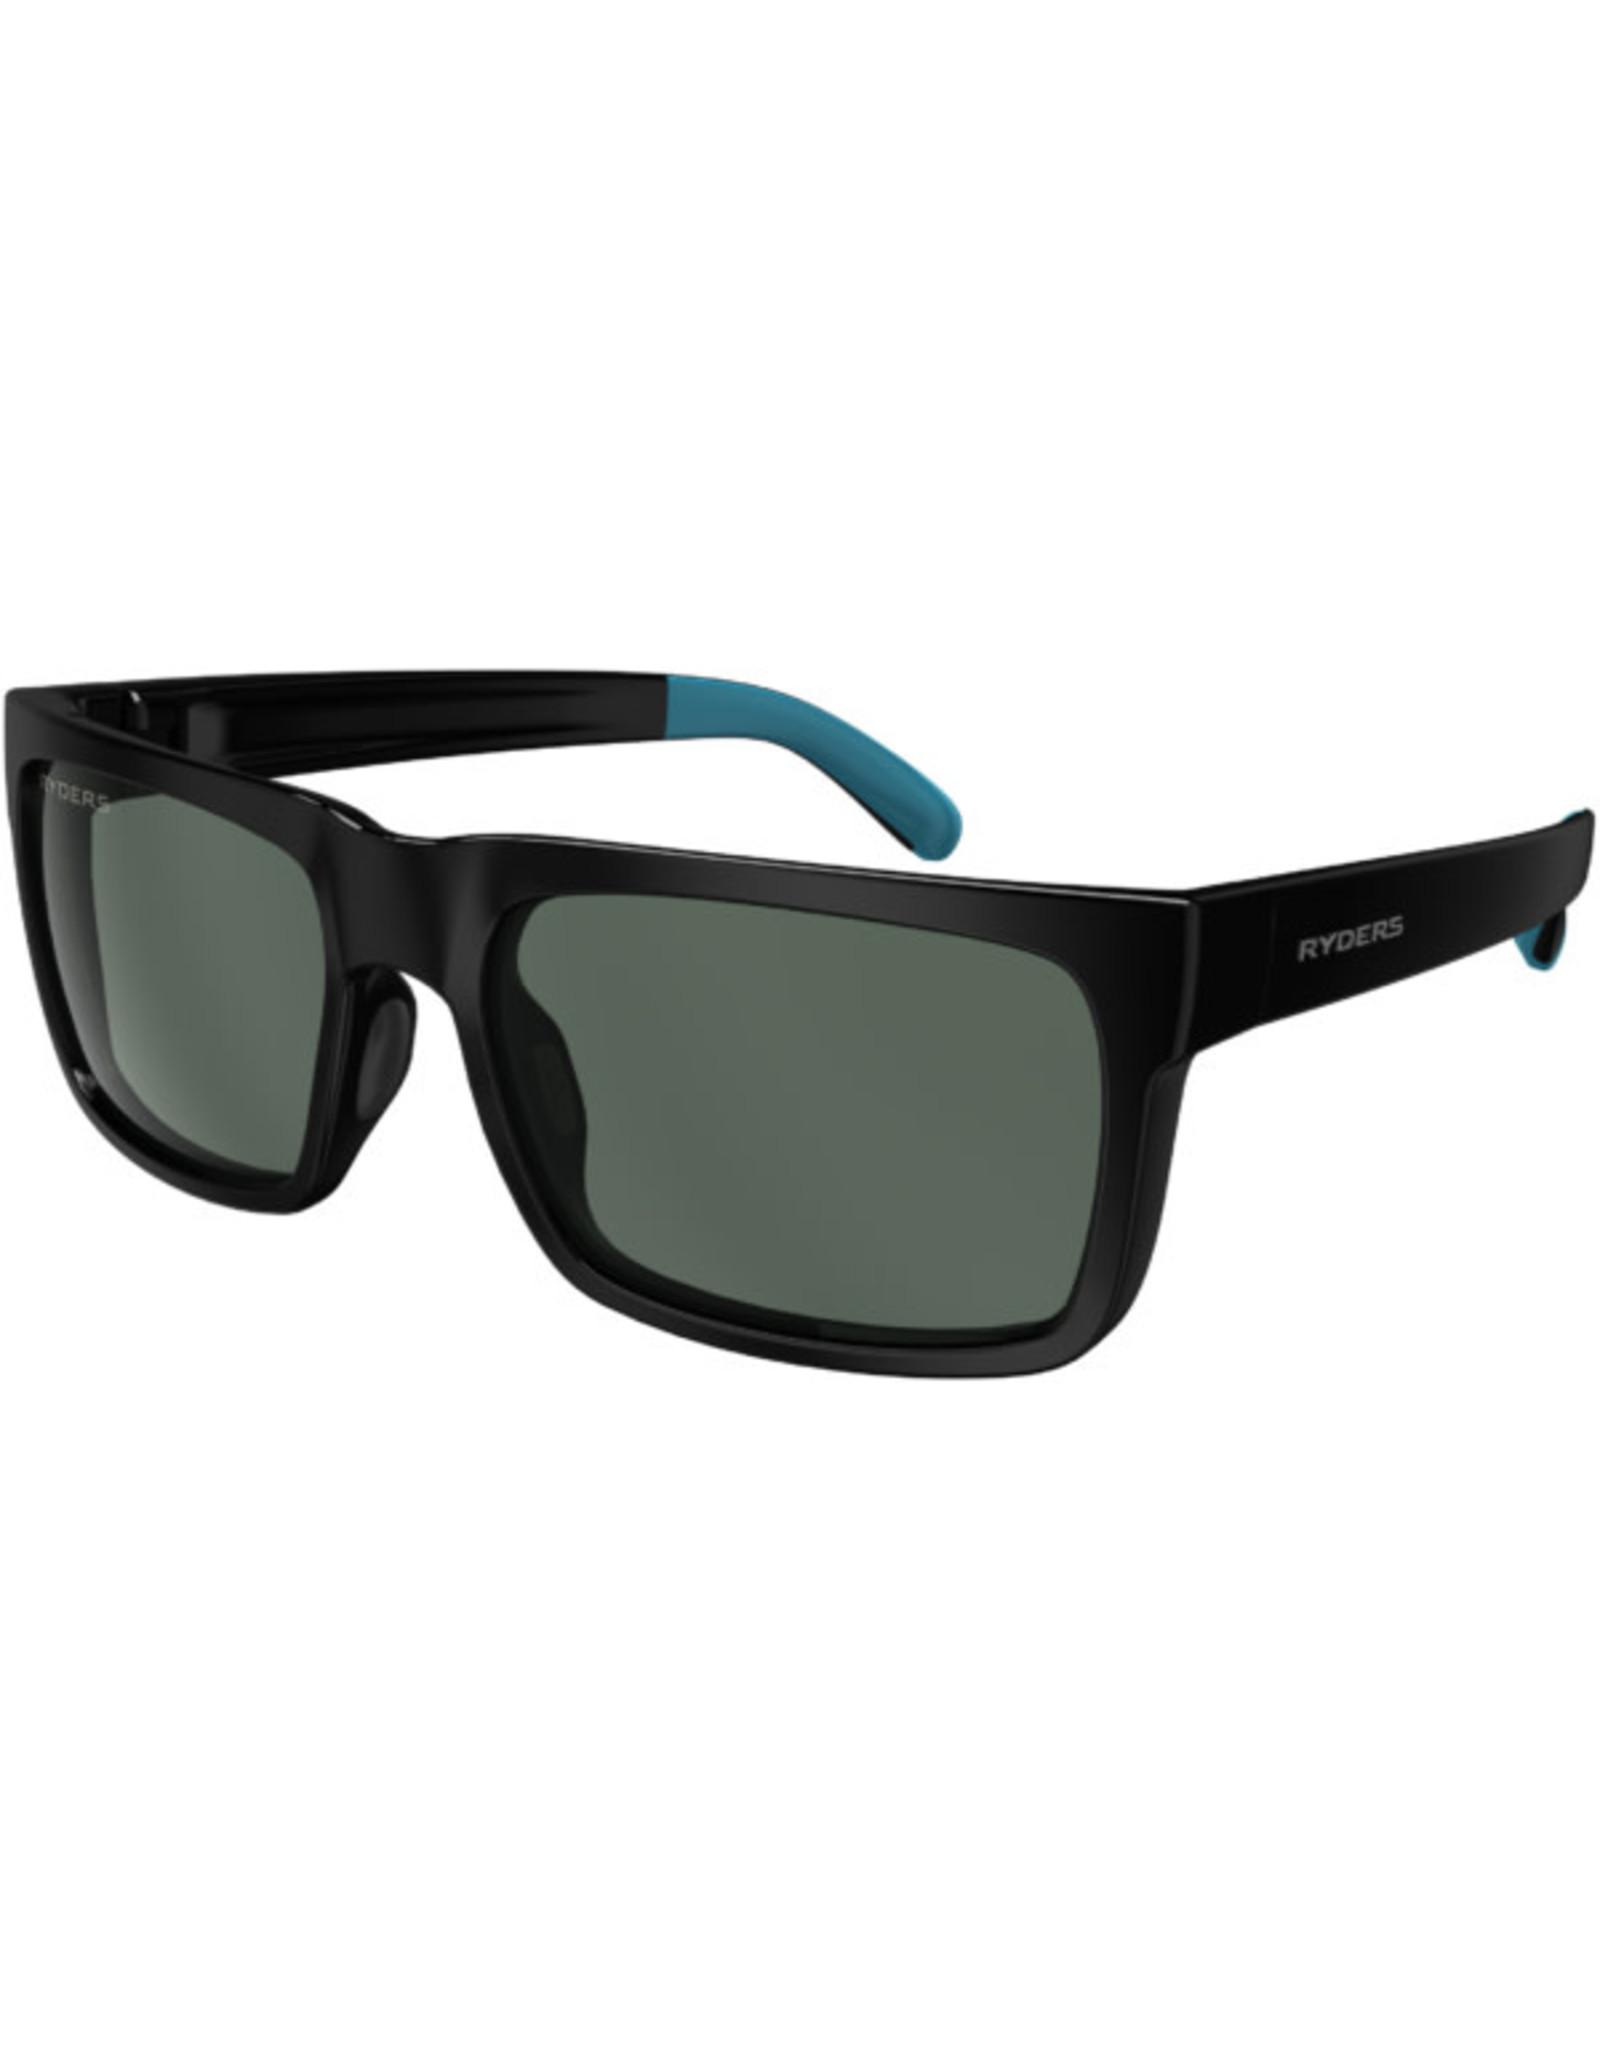 Ryders Eyewear Ryders Pemby Polarized Lens S19